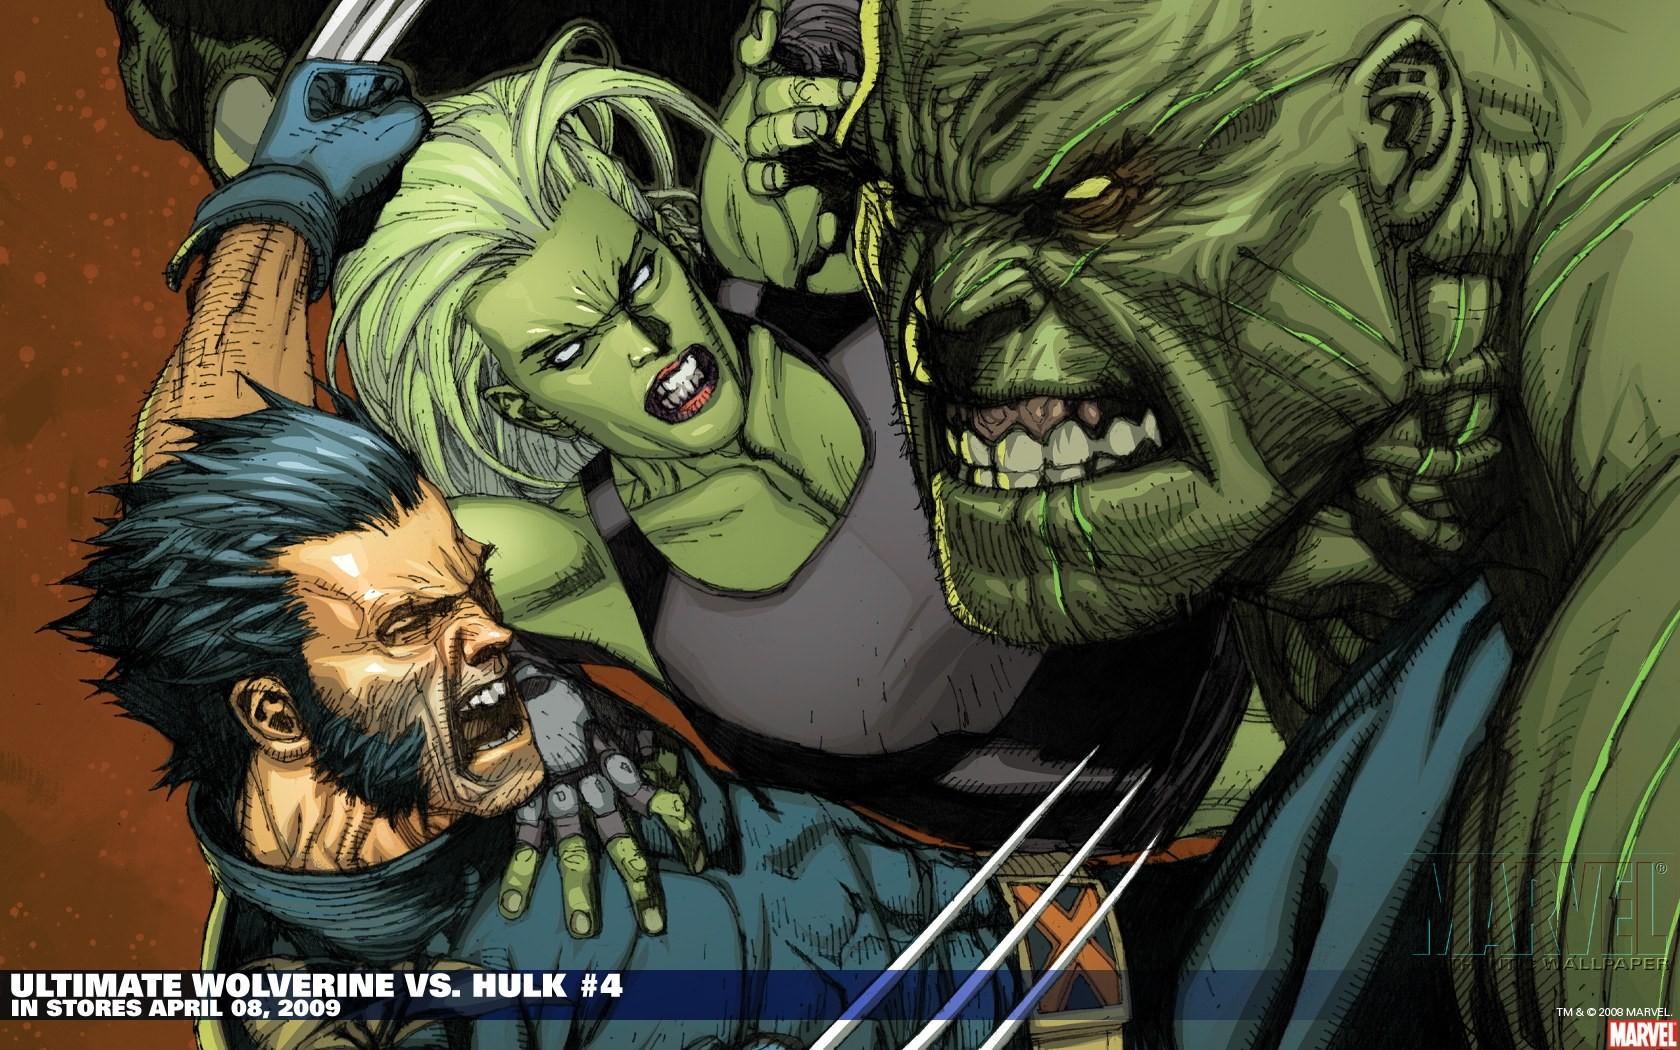 The Hulk Vs Wolverine Desktop And Mobile Wallpaper Wallippo